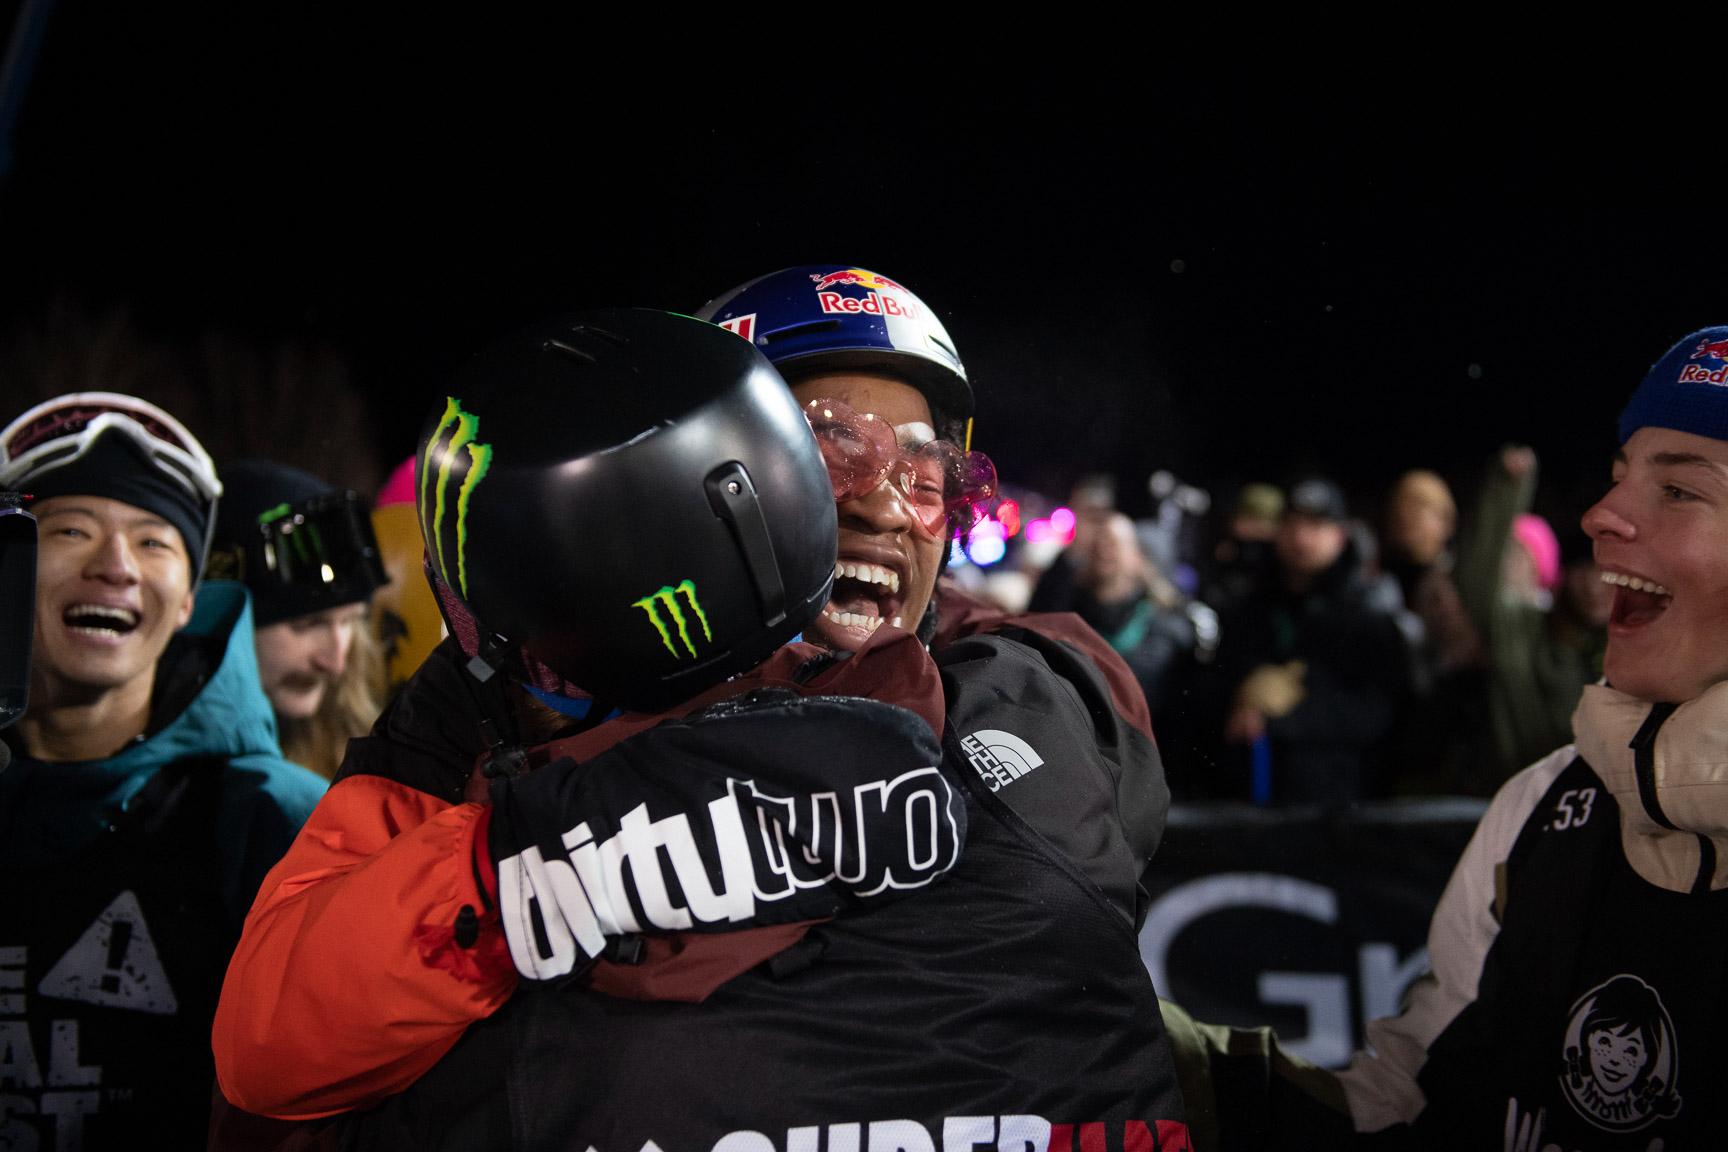 Zeb Powell, Snowboard Knuckle Huck